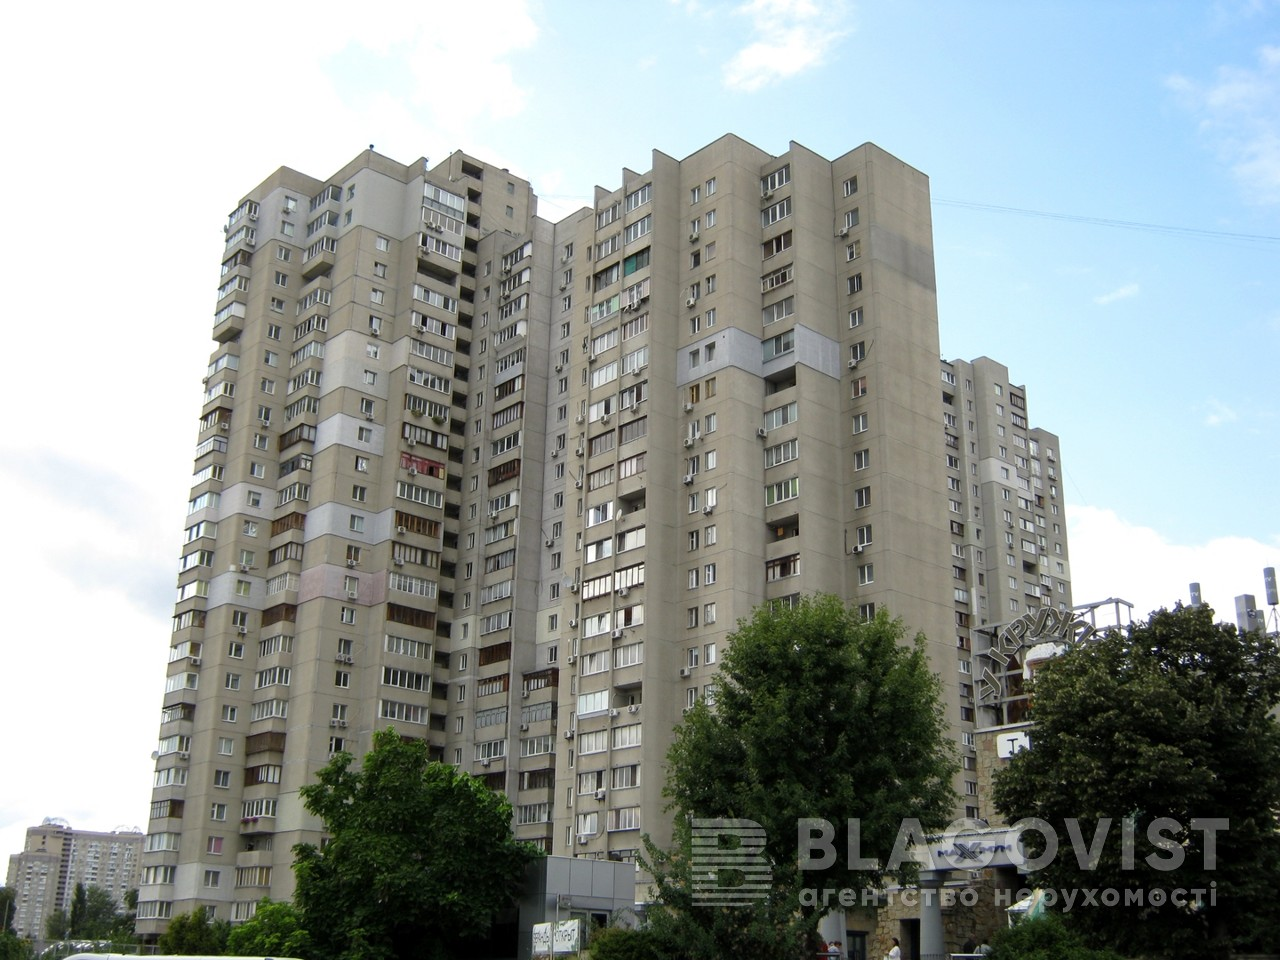 Квартира B-73528, Декабристов, 12/37, Киев - Фото 2